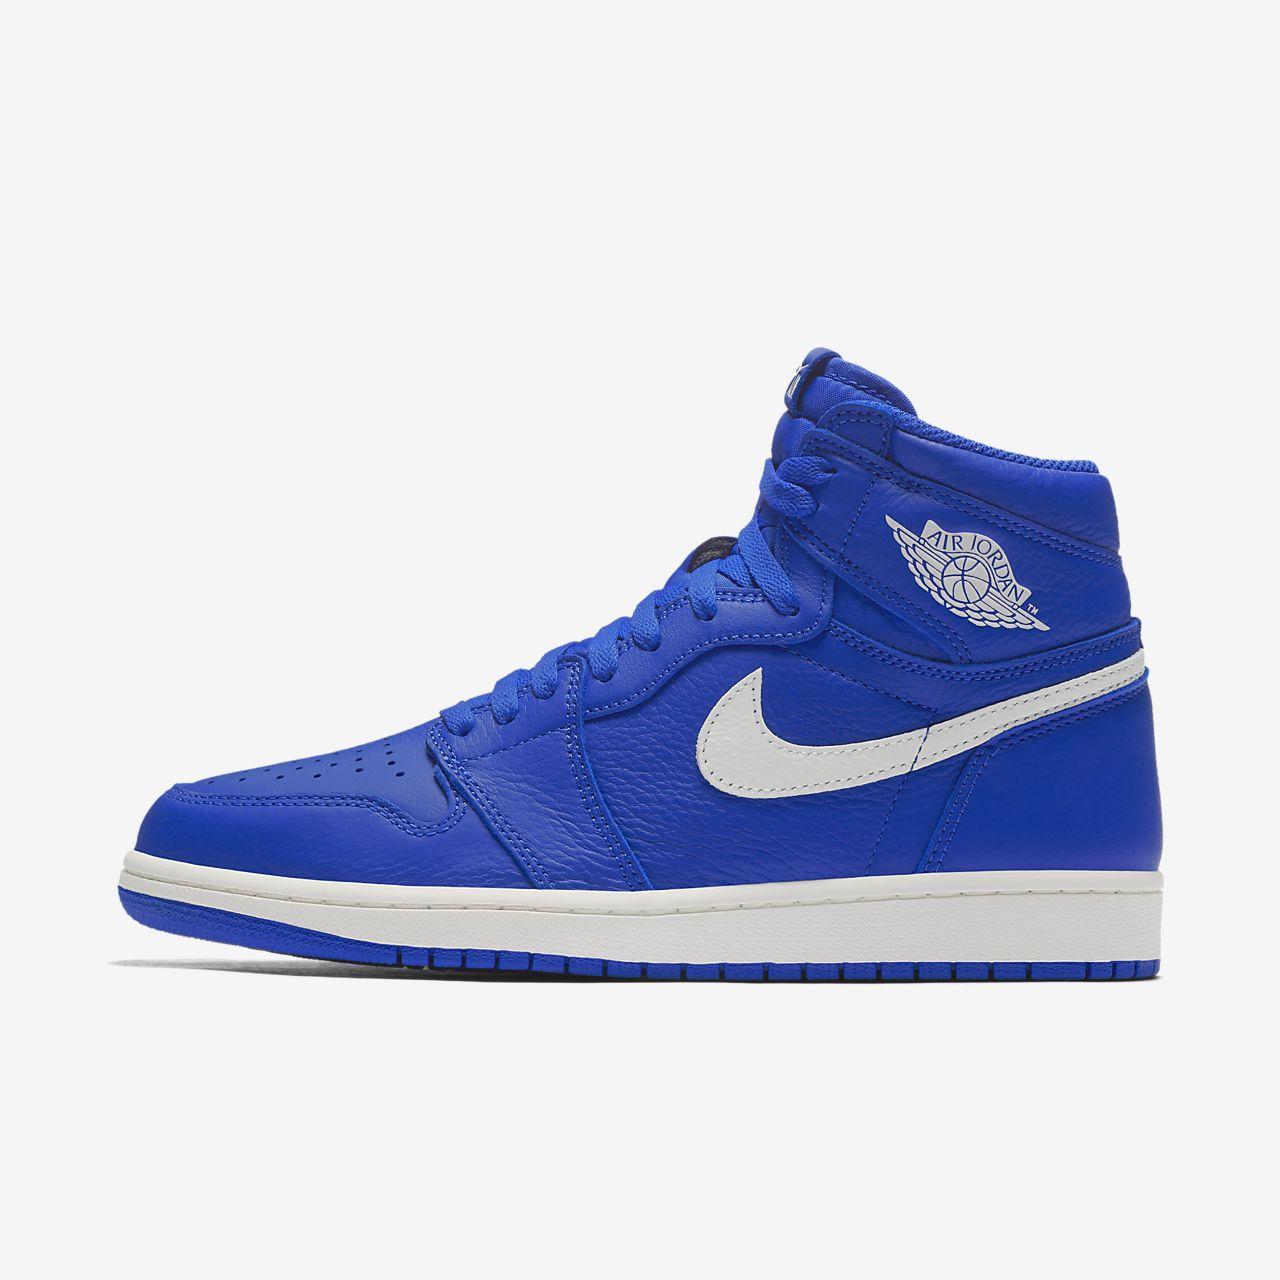 reputable site ba0b7 43801 ... Air Jordan 1 Retro High OG Schuh